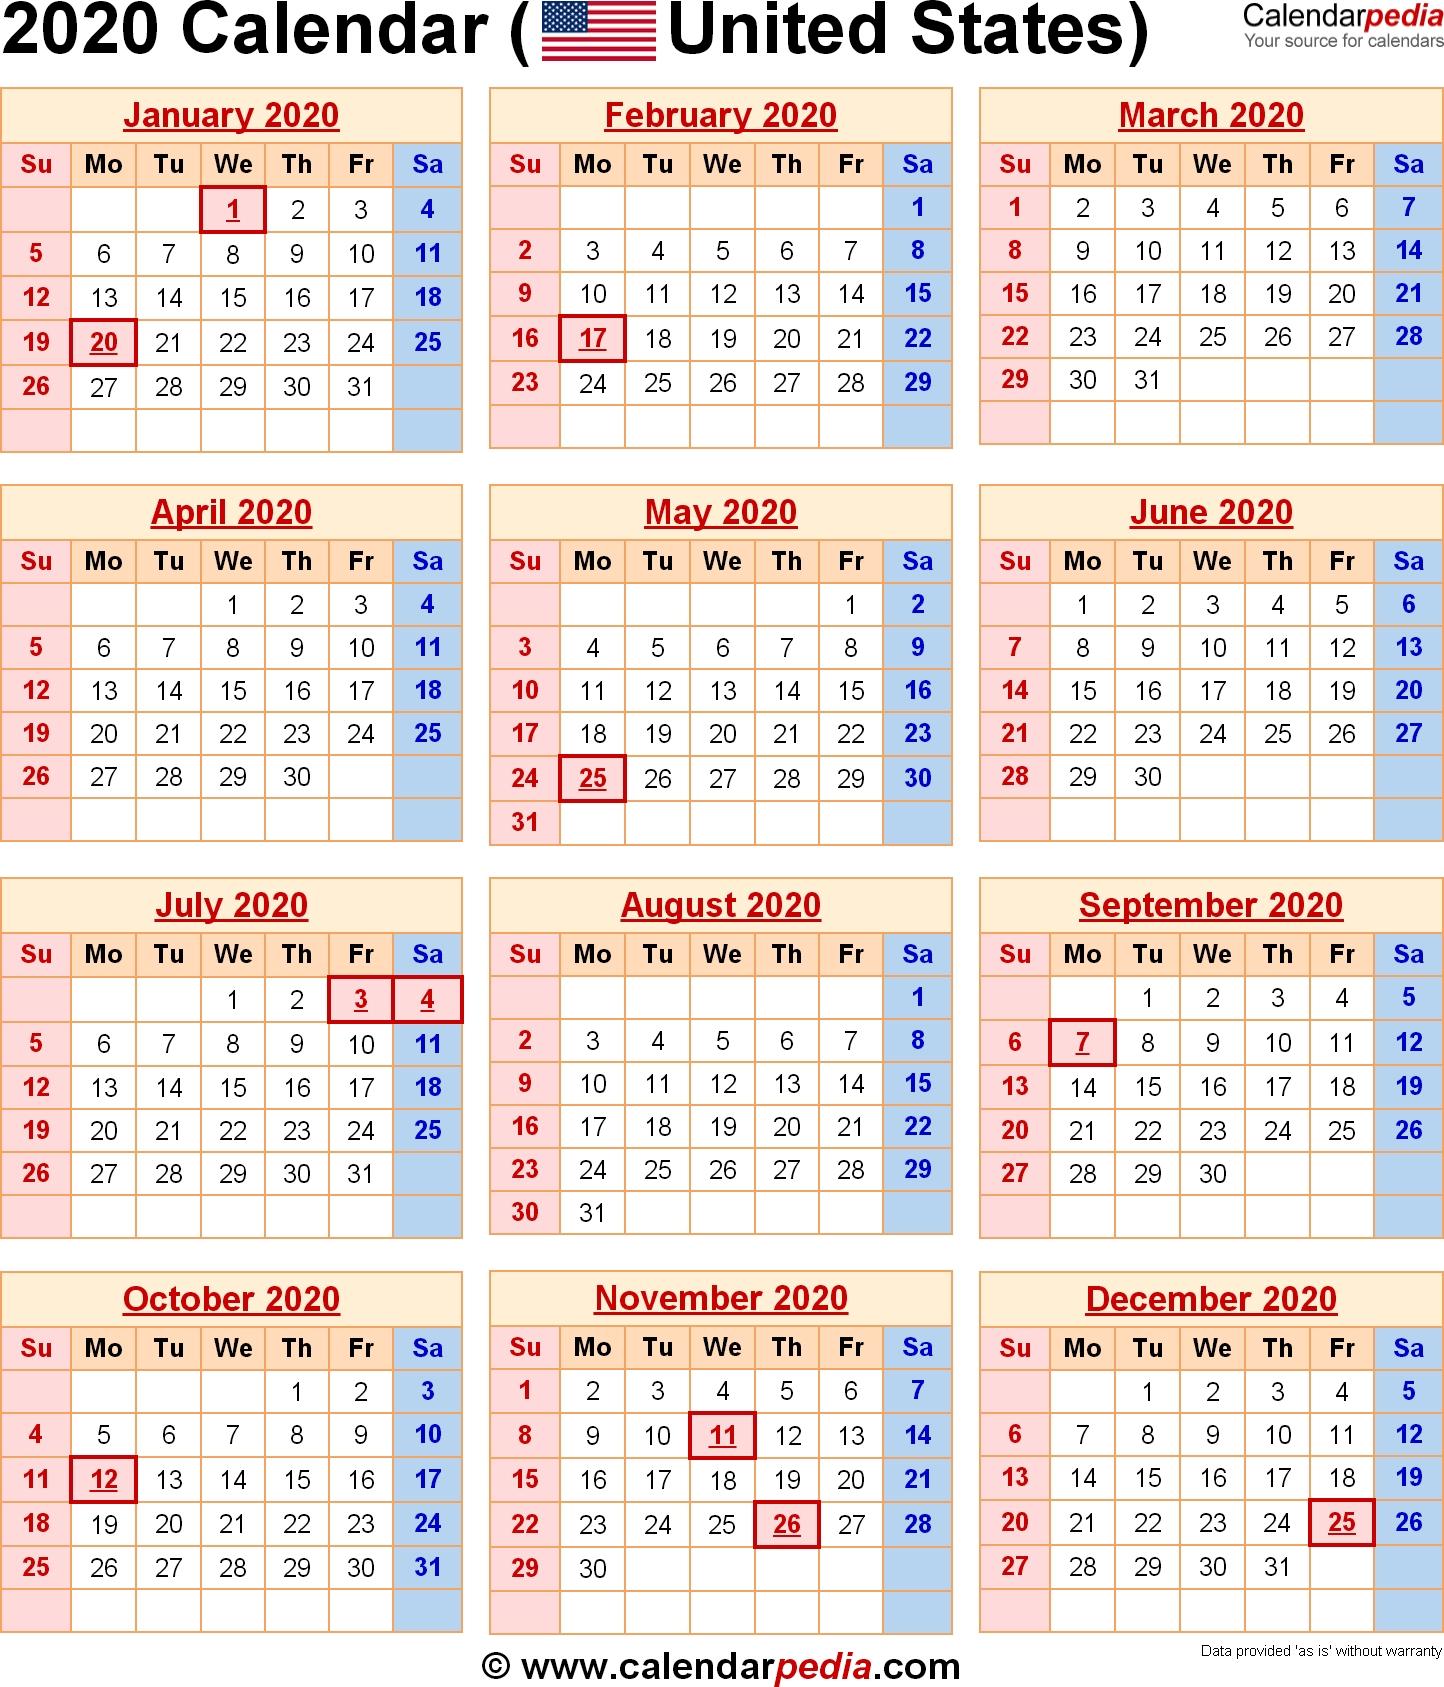 2020 Calendar With Federal Holidays & Excel/pdf/word Templates_Calendar School Usa 2020